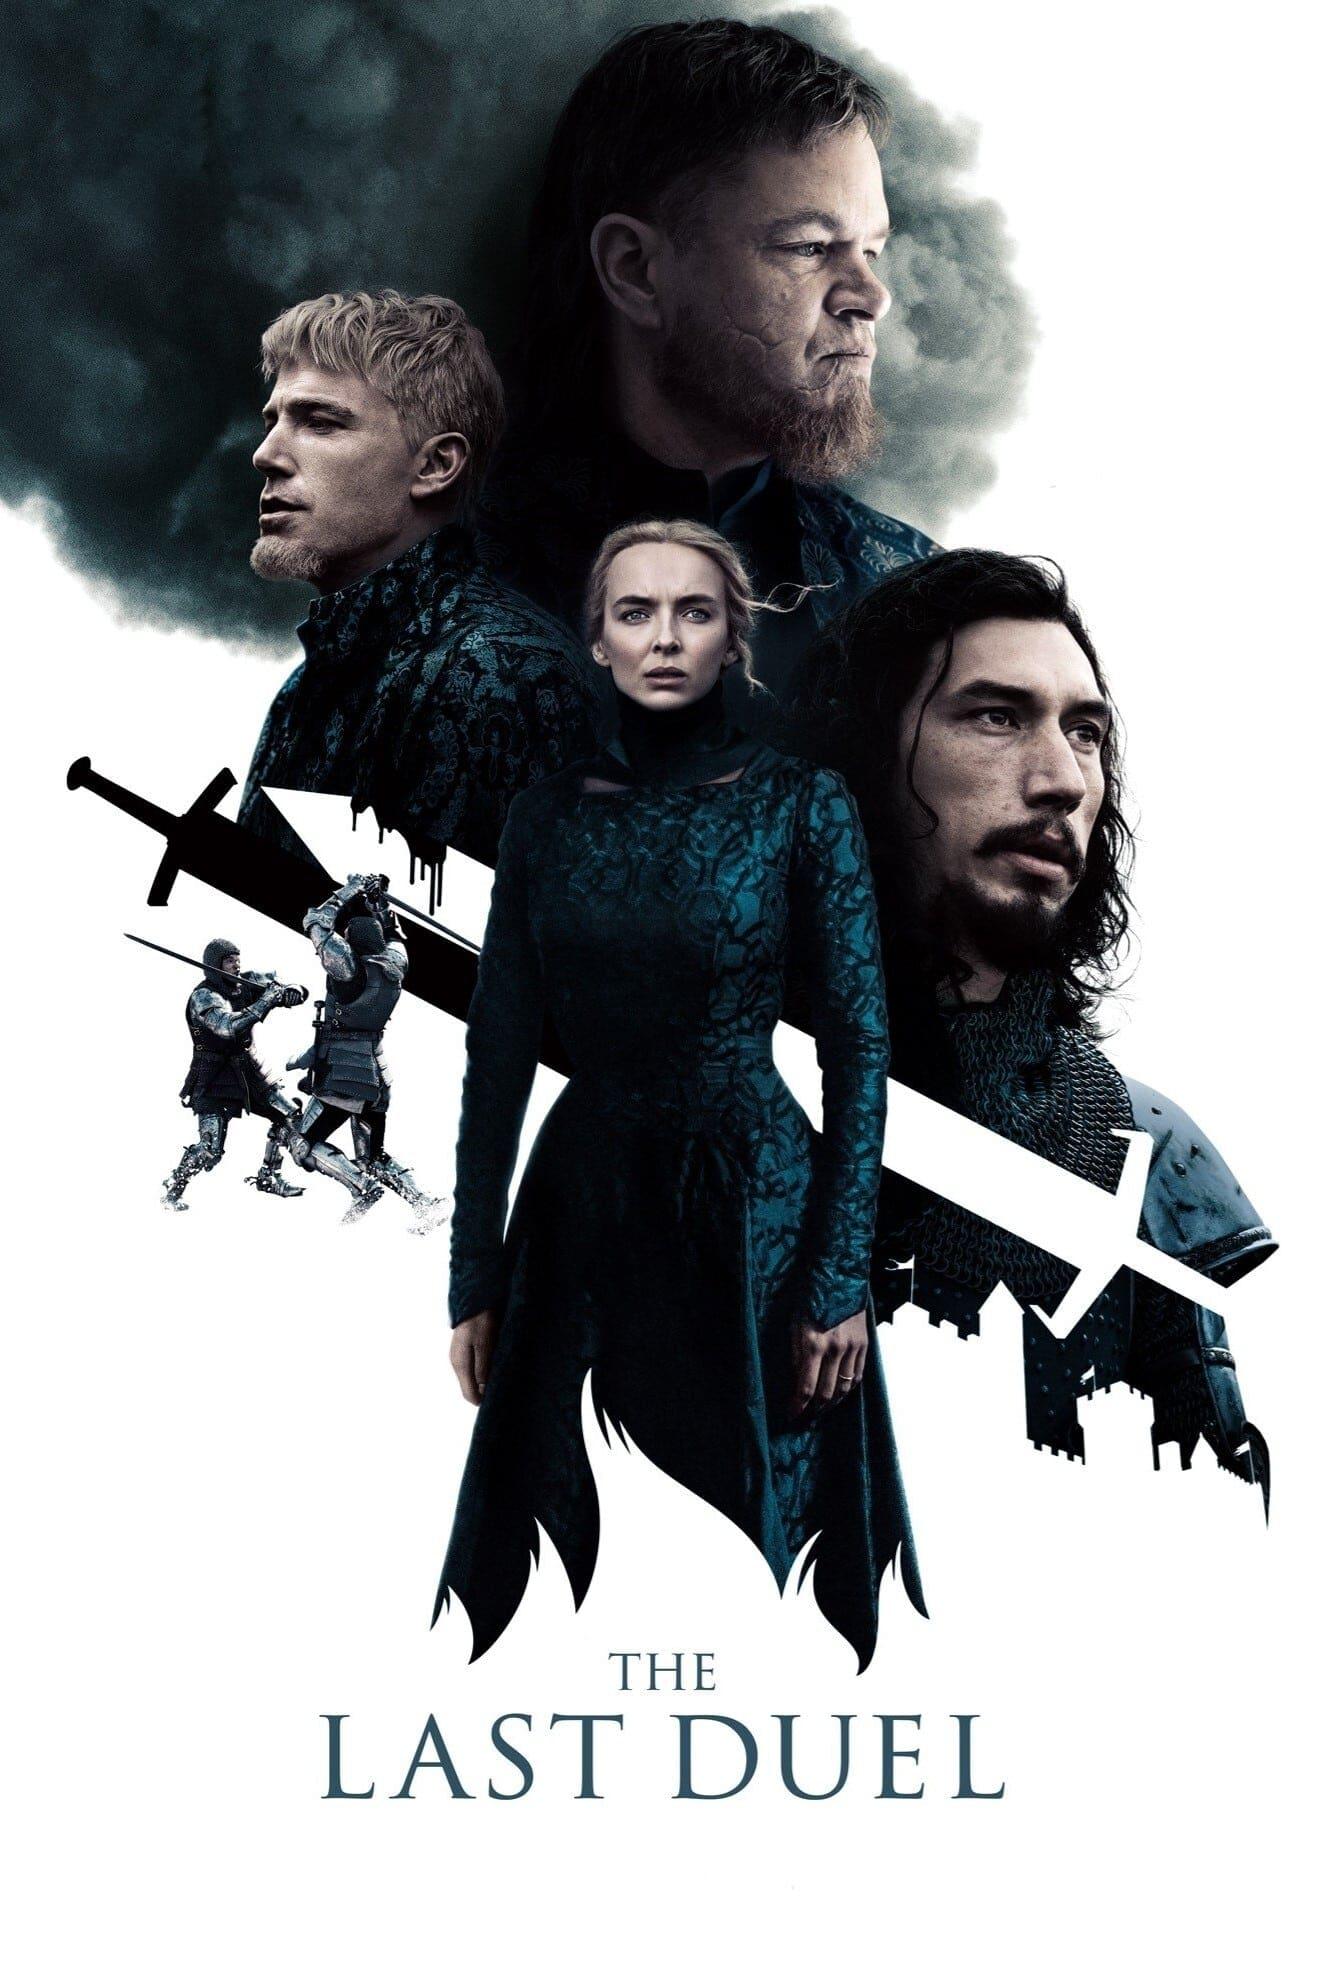 The Last Duel 2021 FULLHD Movie